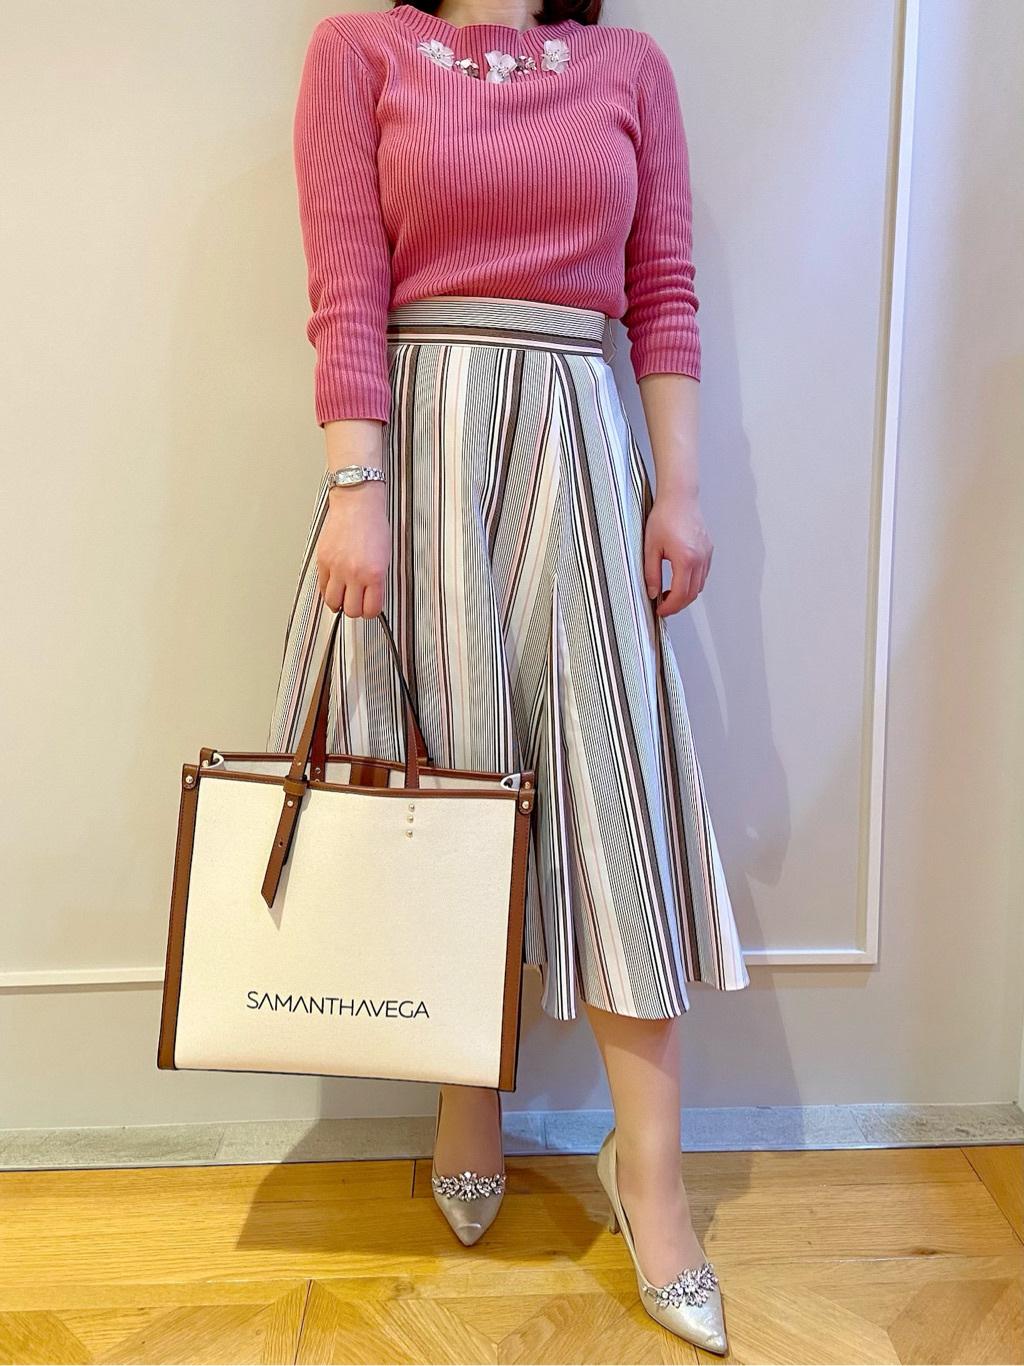 SAMANTHAVEGA 東京スカイツリータウンソラマチ店 ✿T✿